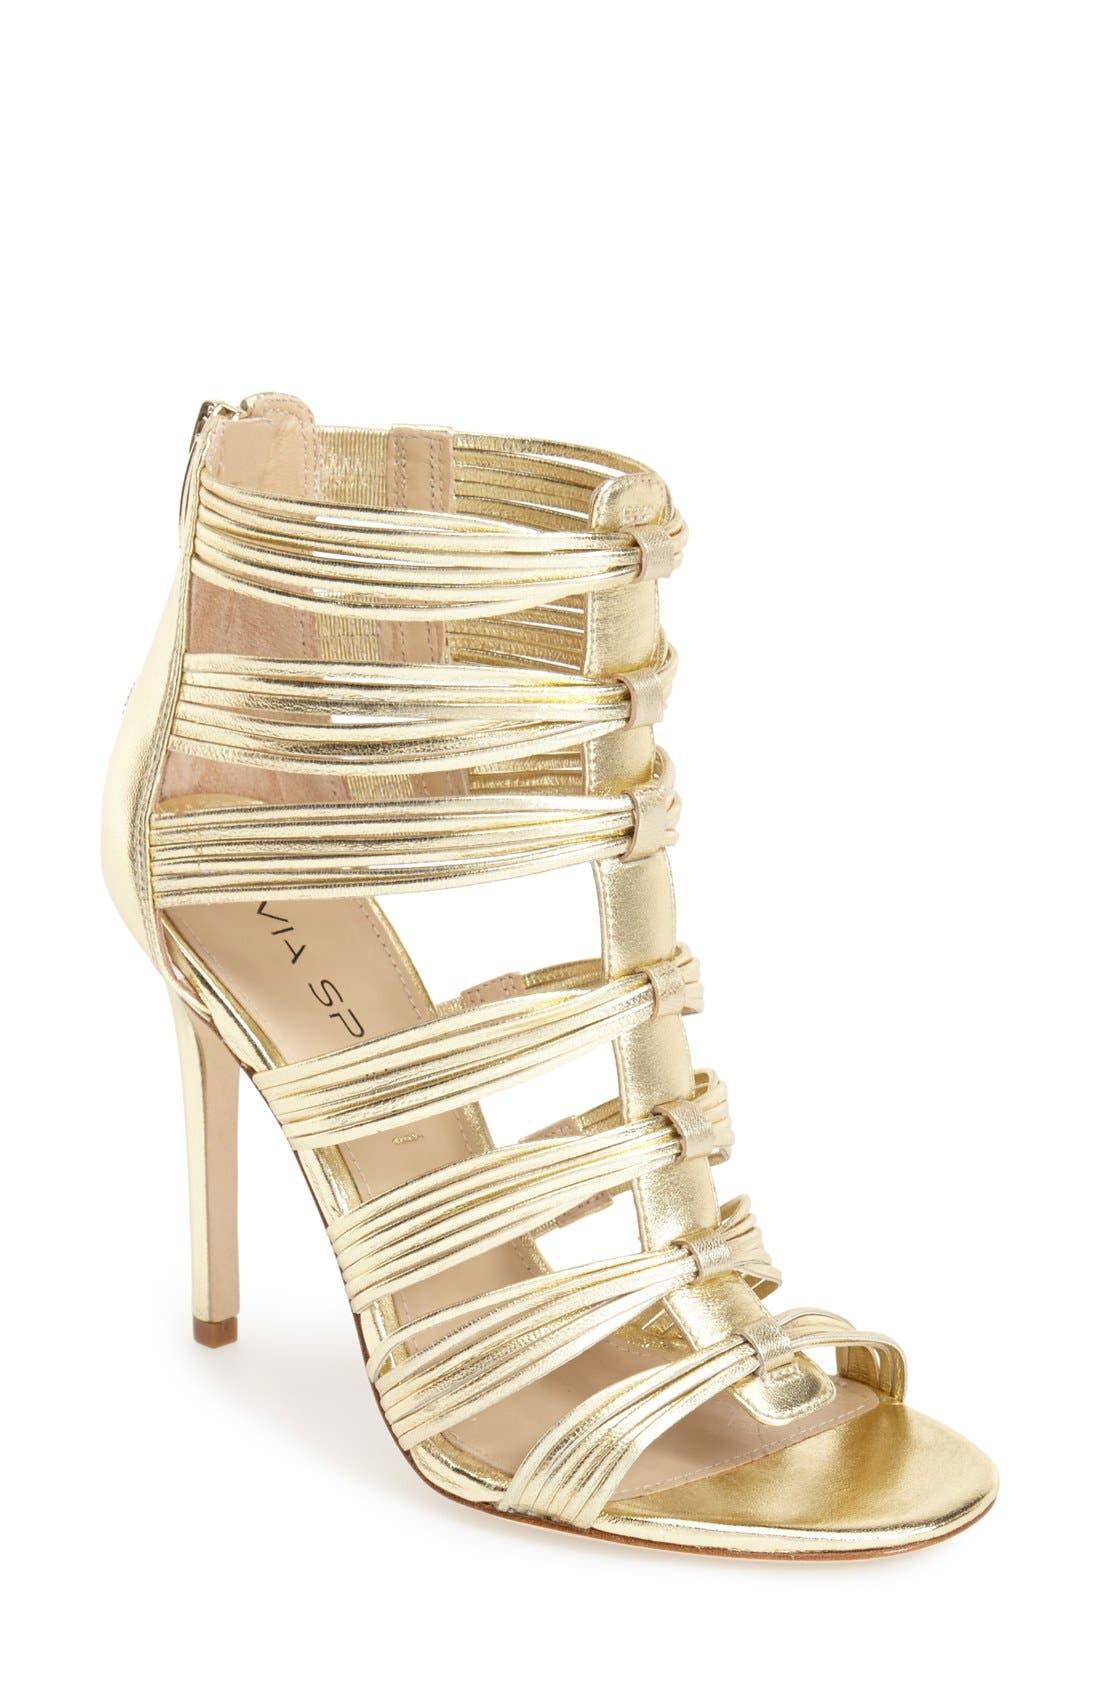 Alternate Image 1 Selected - Via Spiga 'Terelle' Open Toe Cage Leather Sandal (Women)